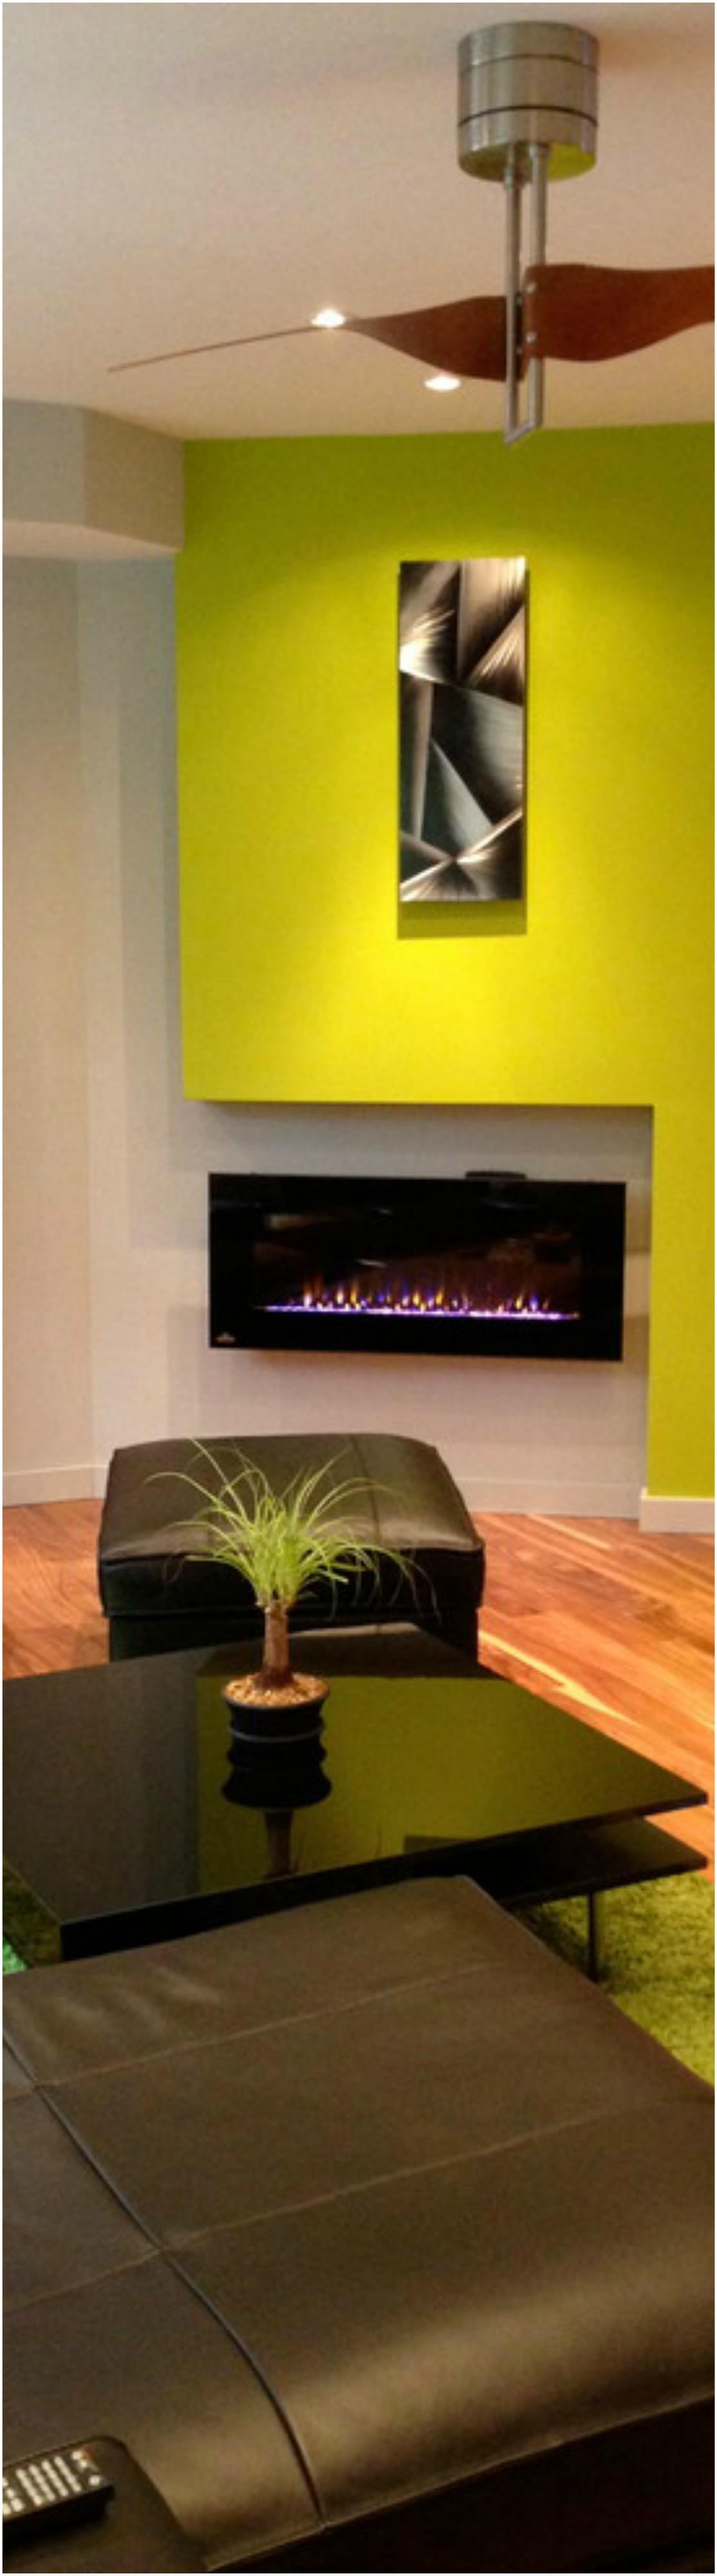 Basement Corner Fireplace Design